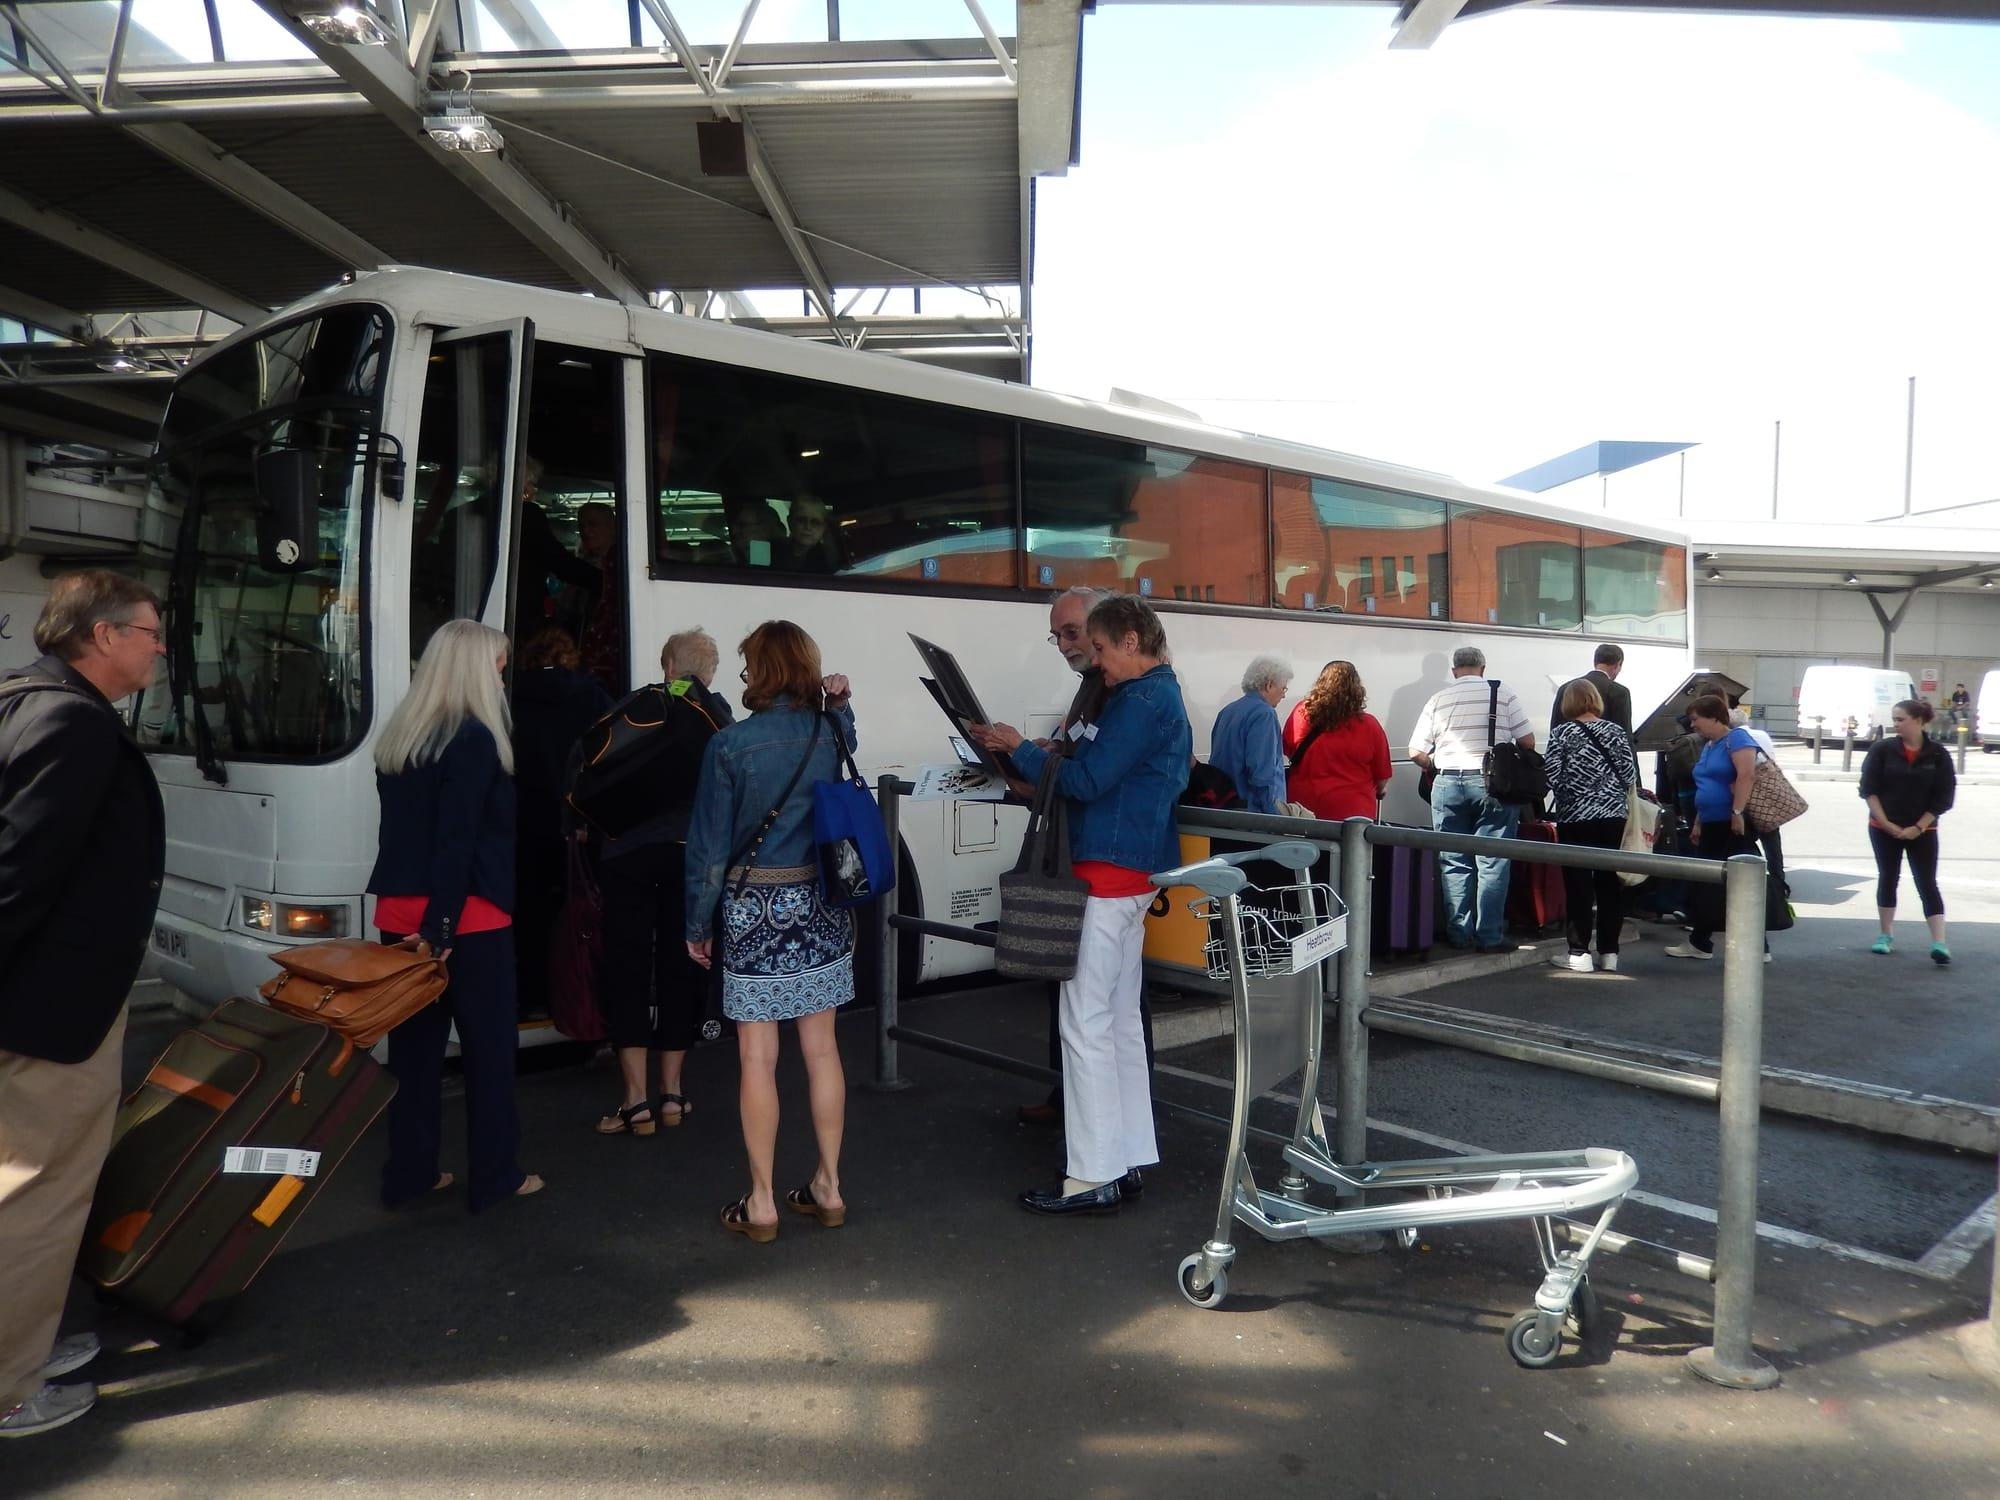 CFA members boarding buses at Heathrow Airport in 2014